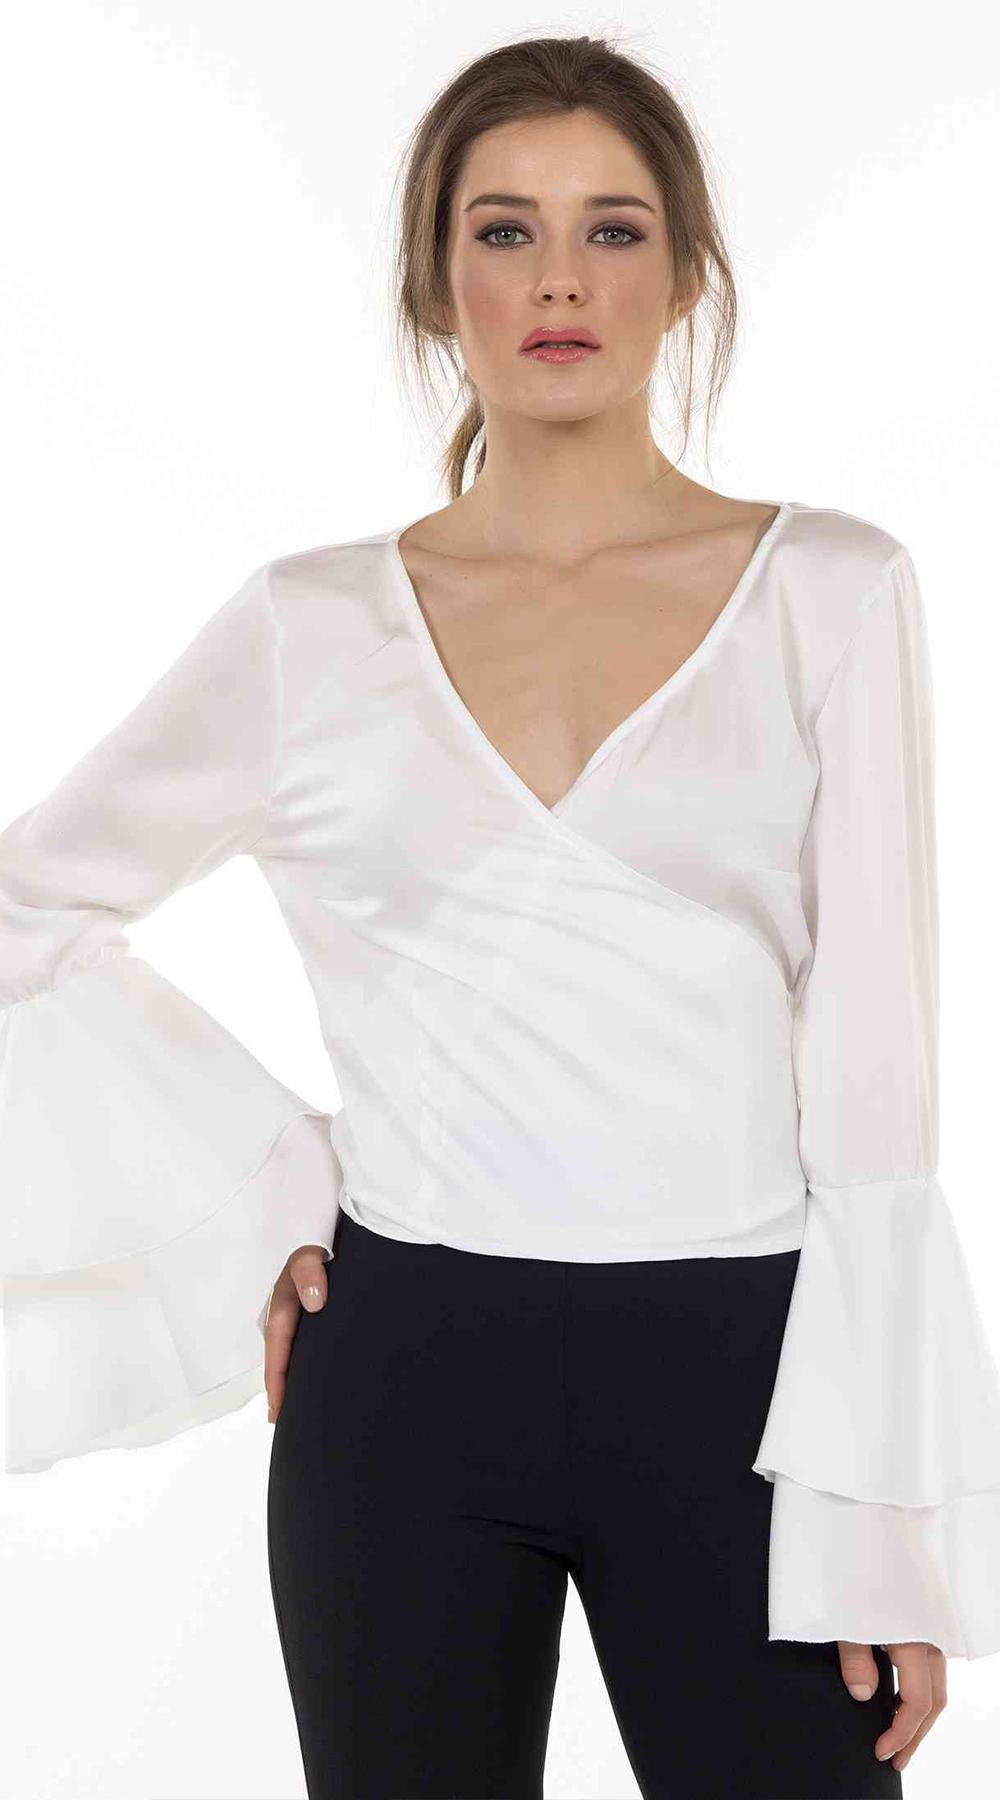 245d237f791e Γυναικεία κρουαζέ μπλούζα σατινέ με βολάν μανίκια Online